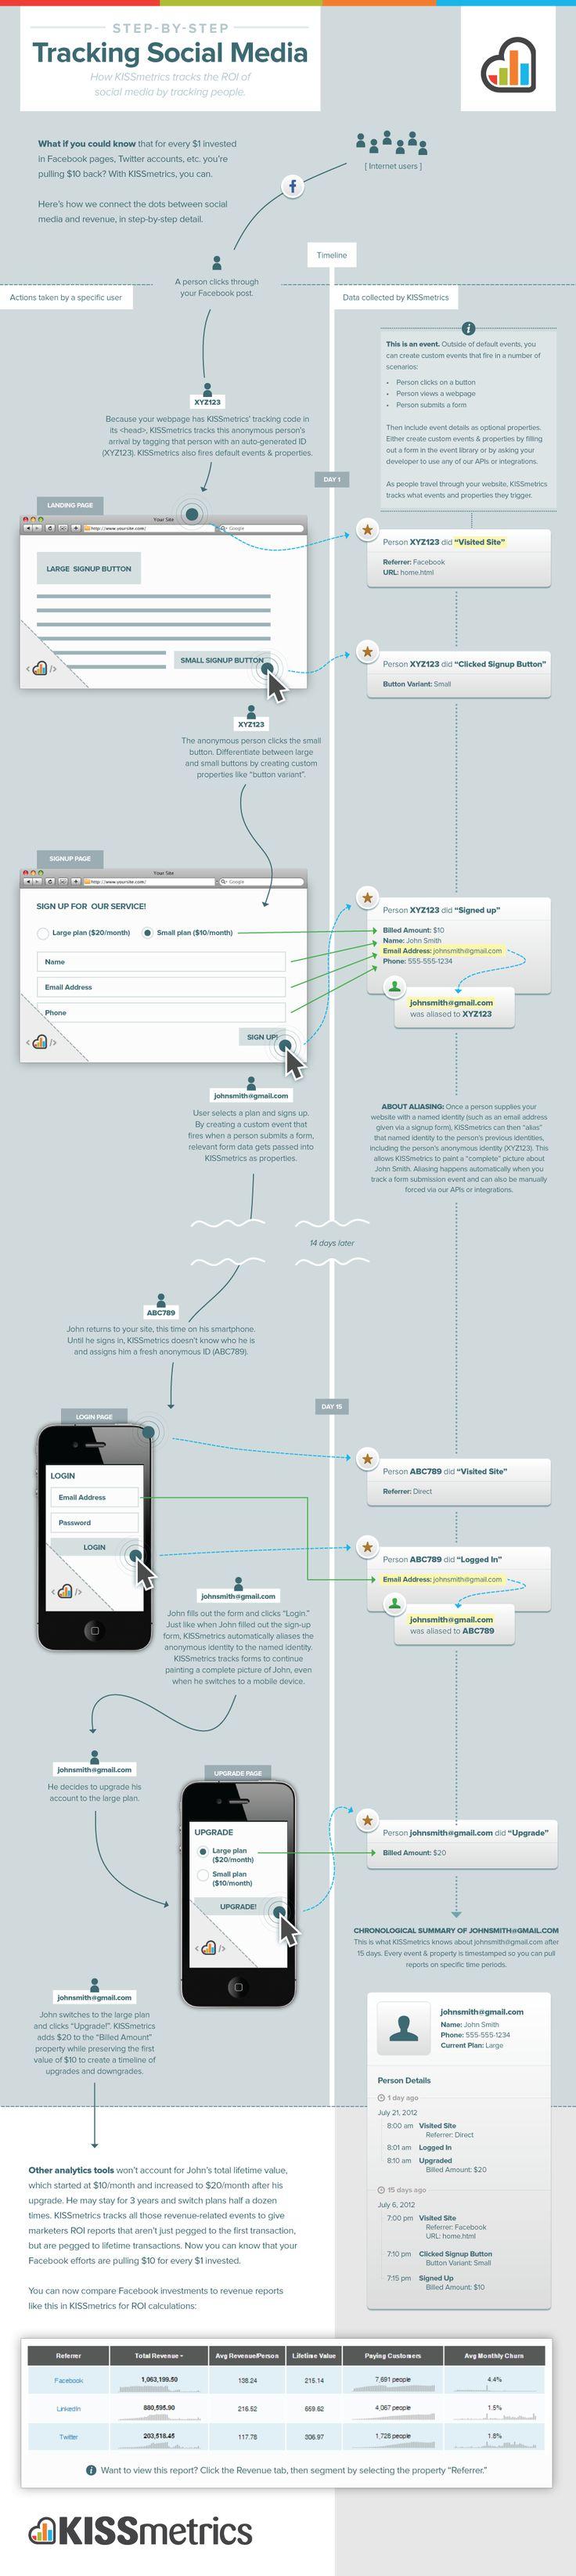 KISSmetrics - social media ROI infographic